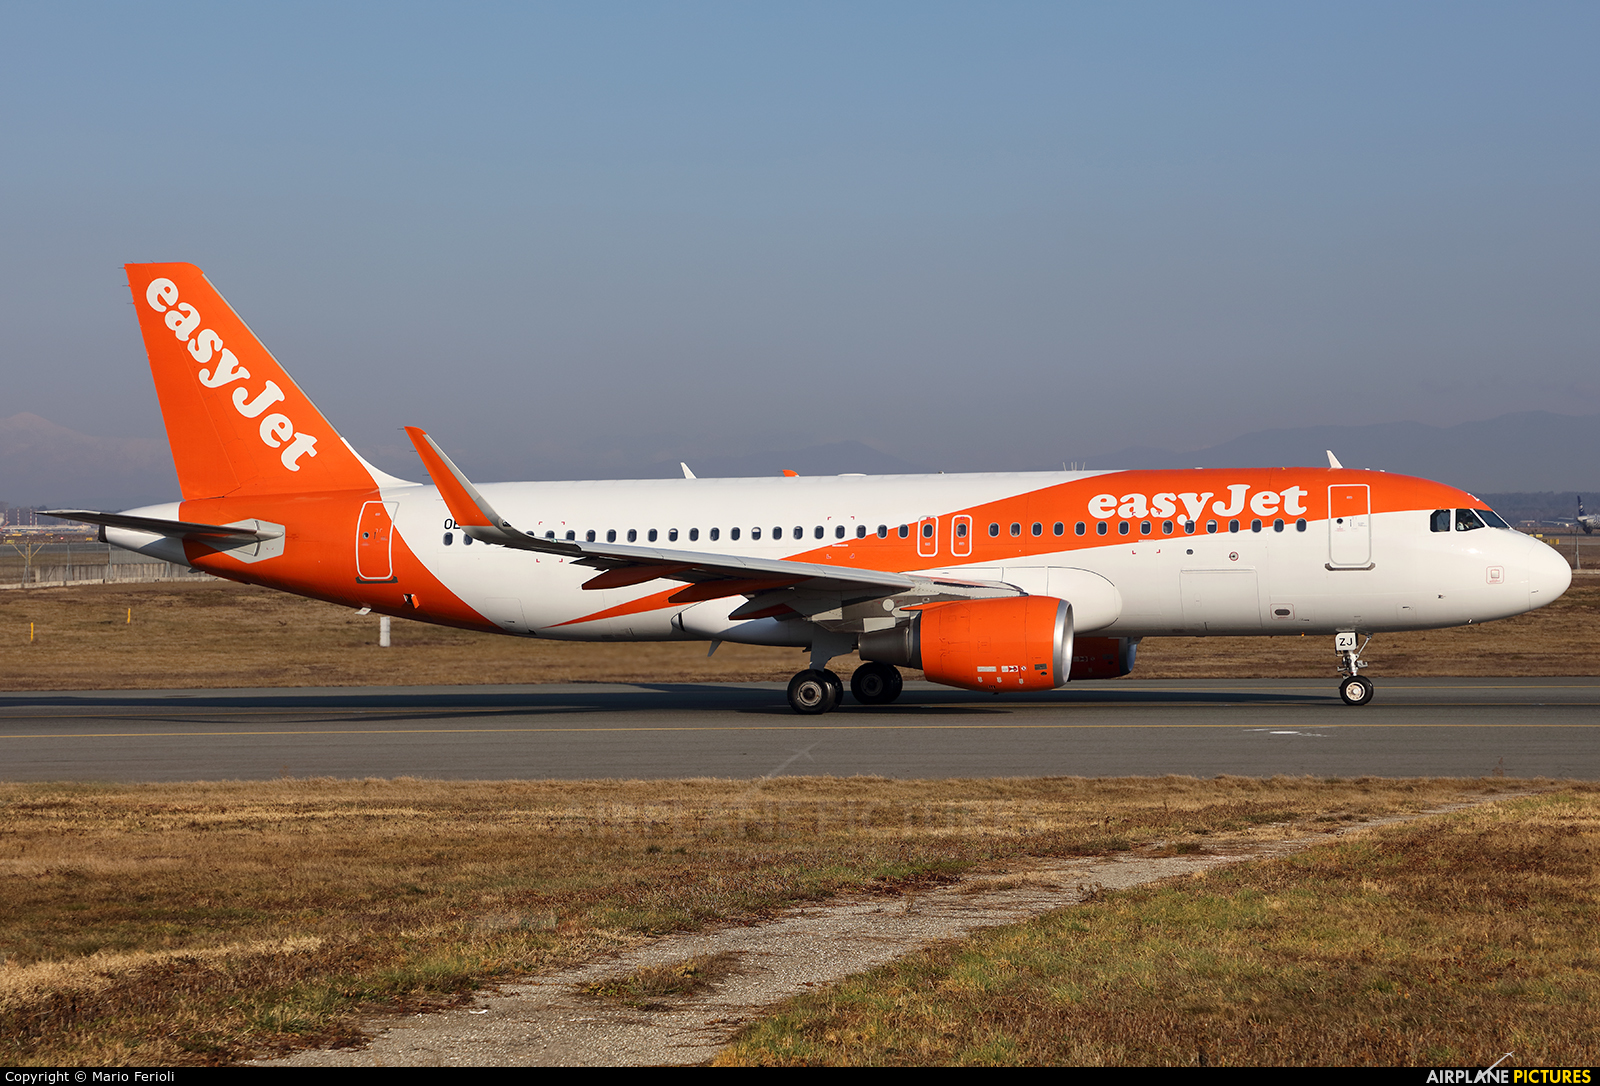 easyJet Europe OE-IZJ aircraft at Milan - Malpensa